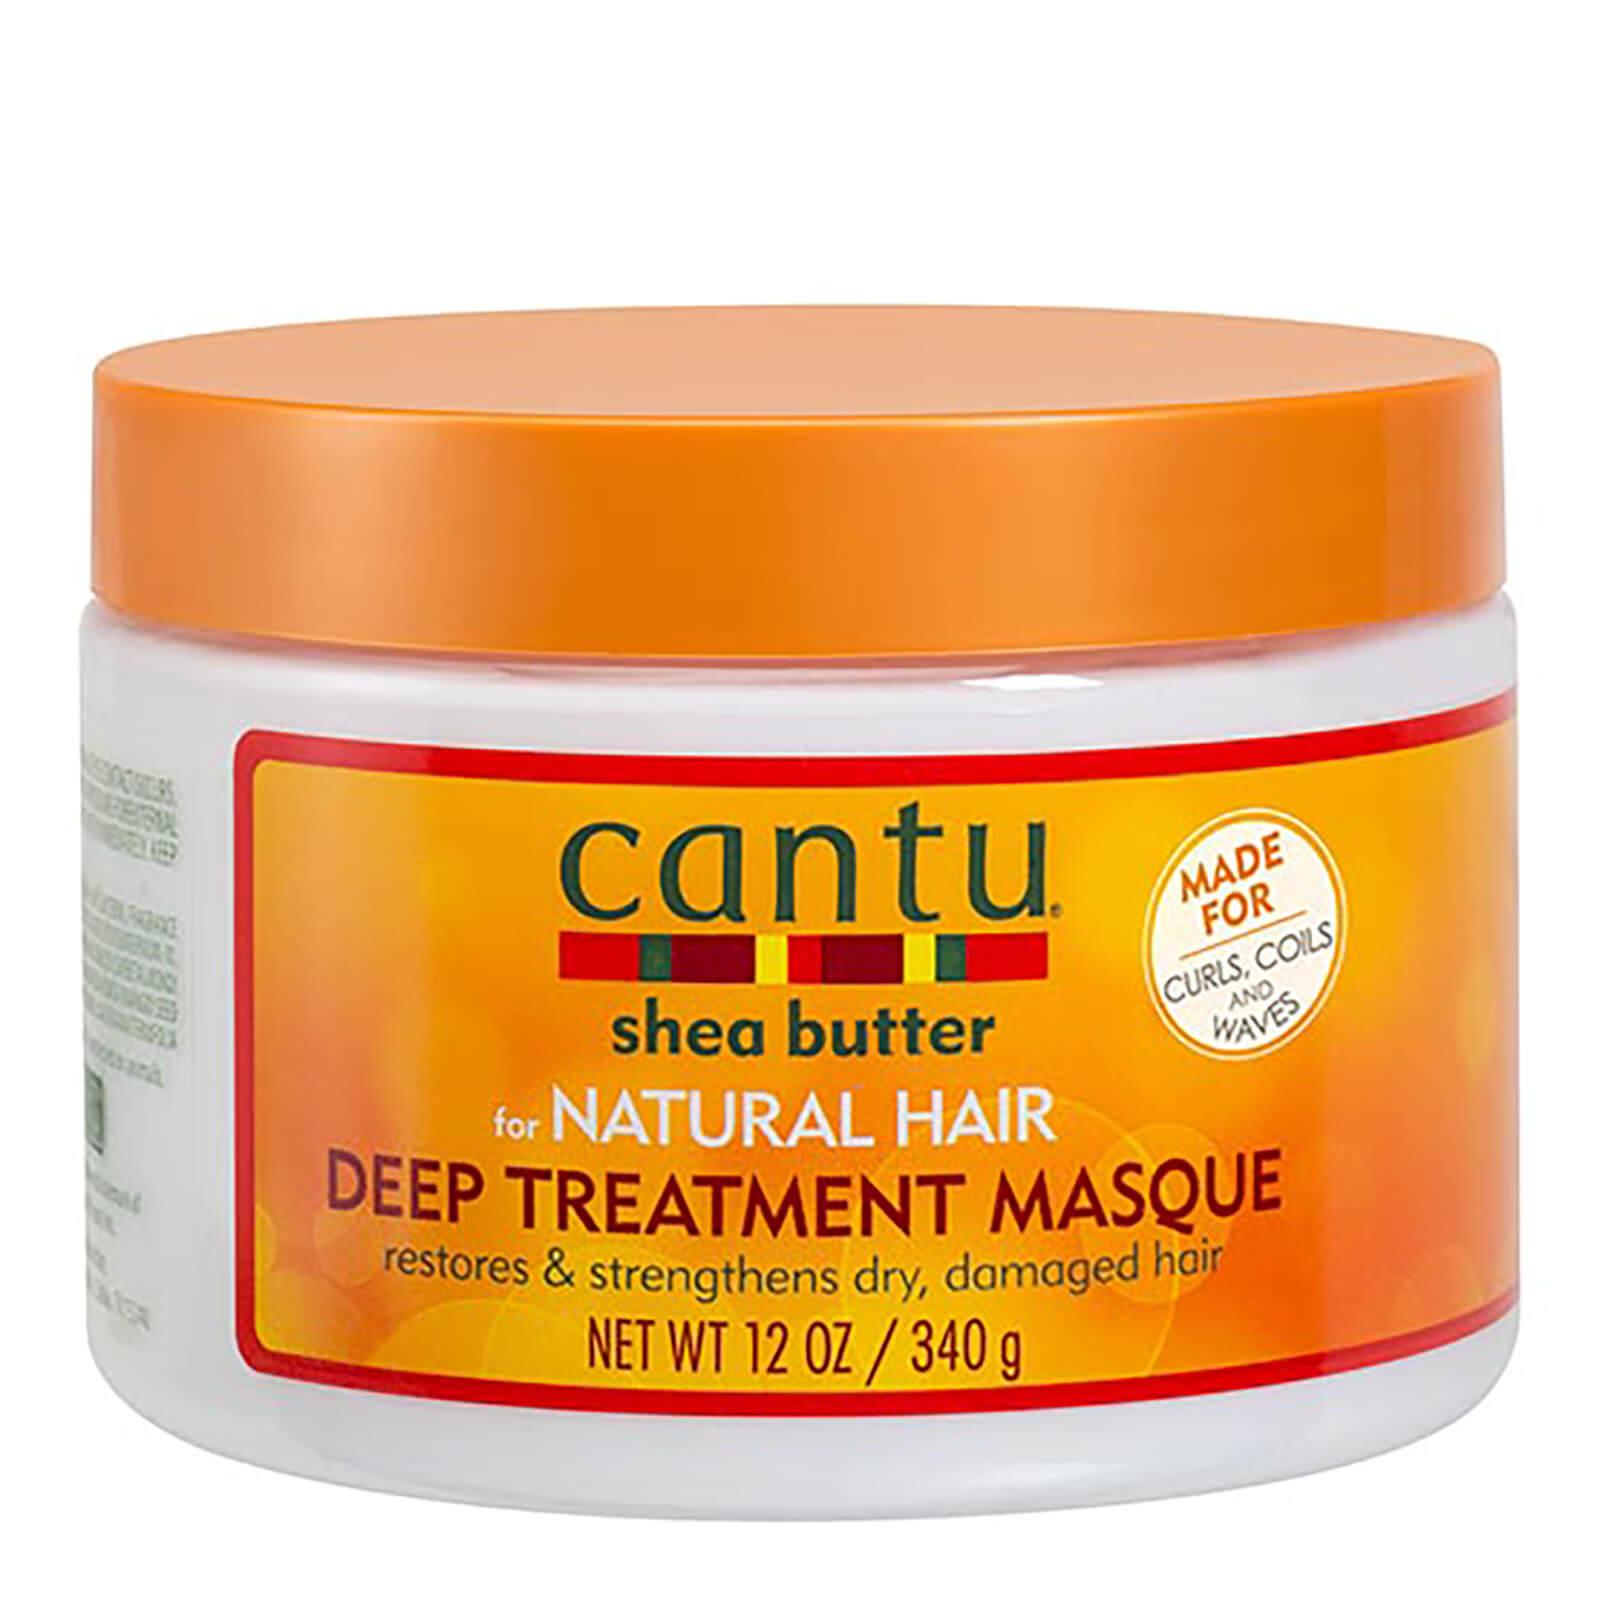 Купить Cantu Shea Butter for Natural Hair Deep Treatment Masque